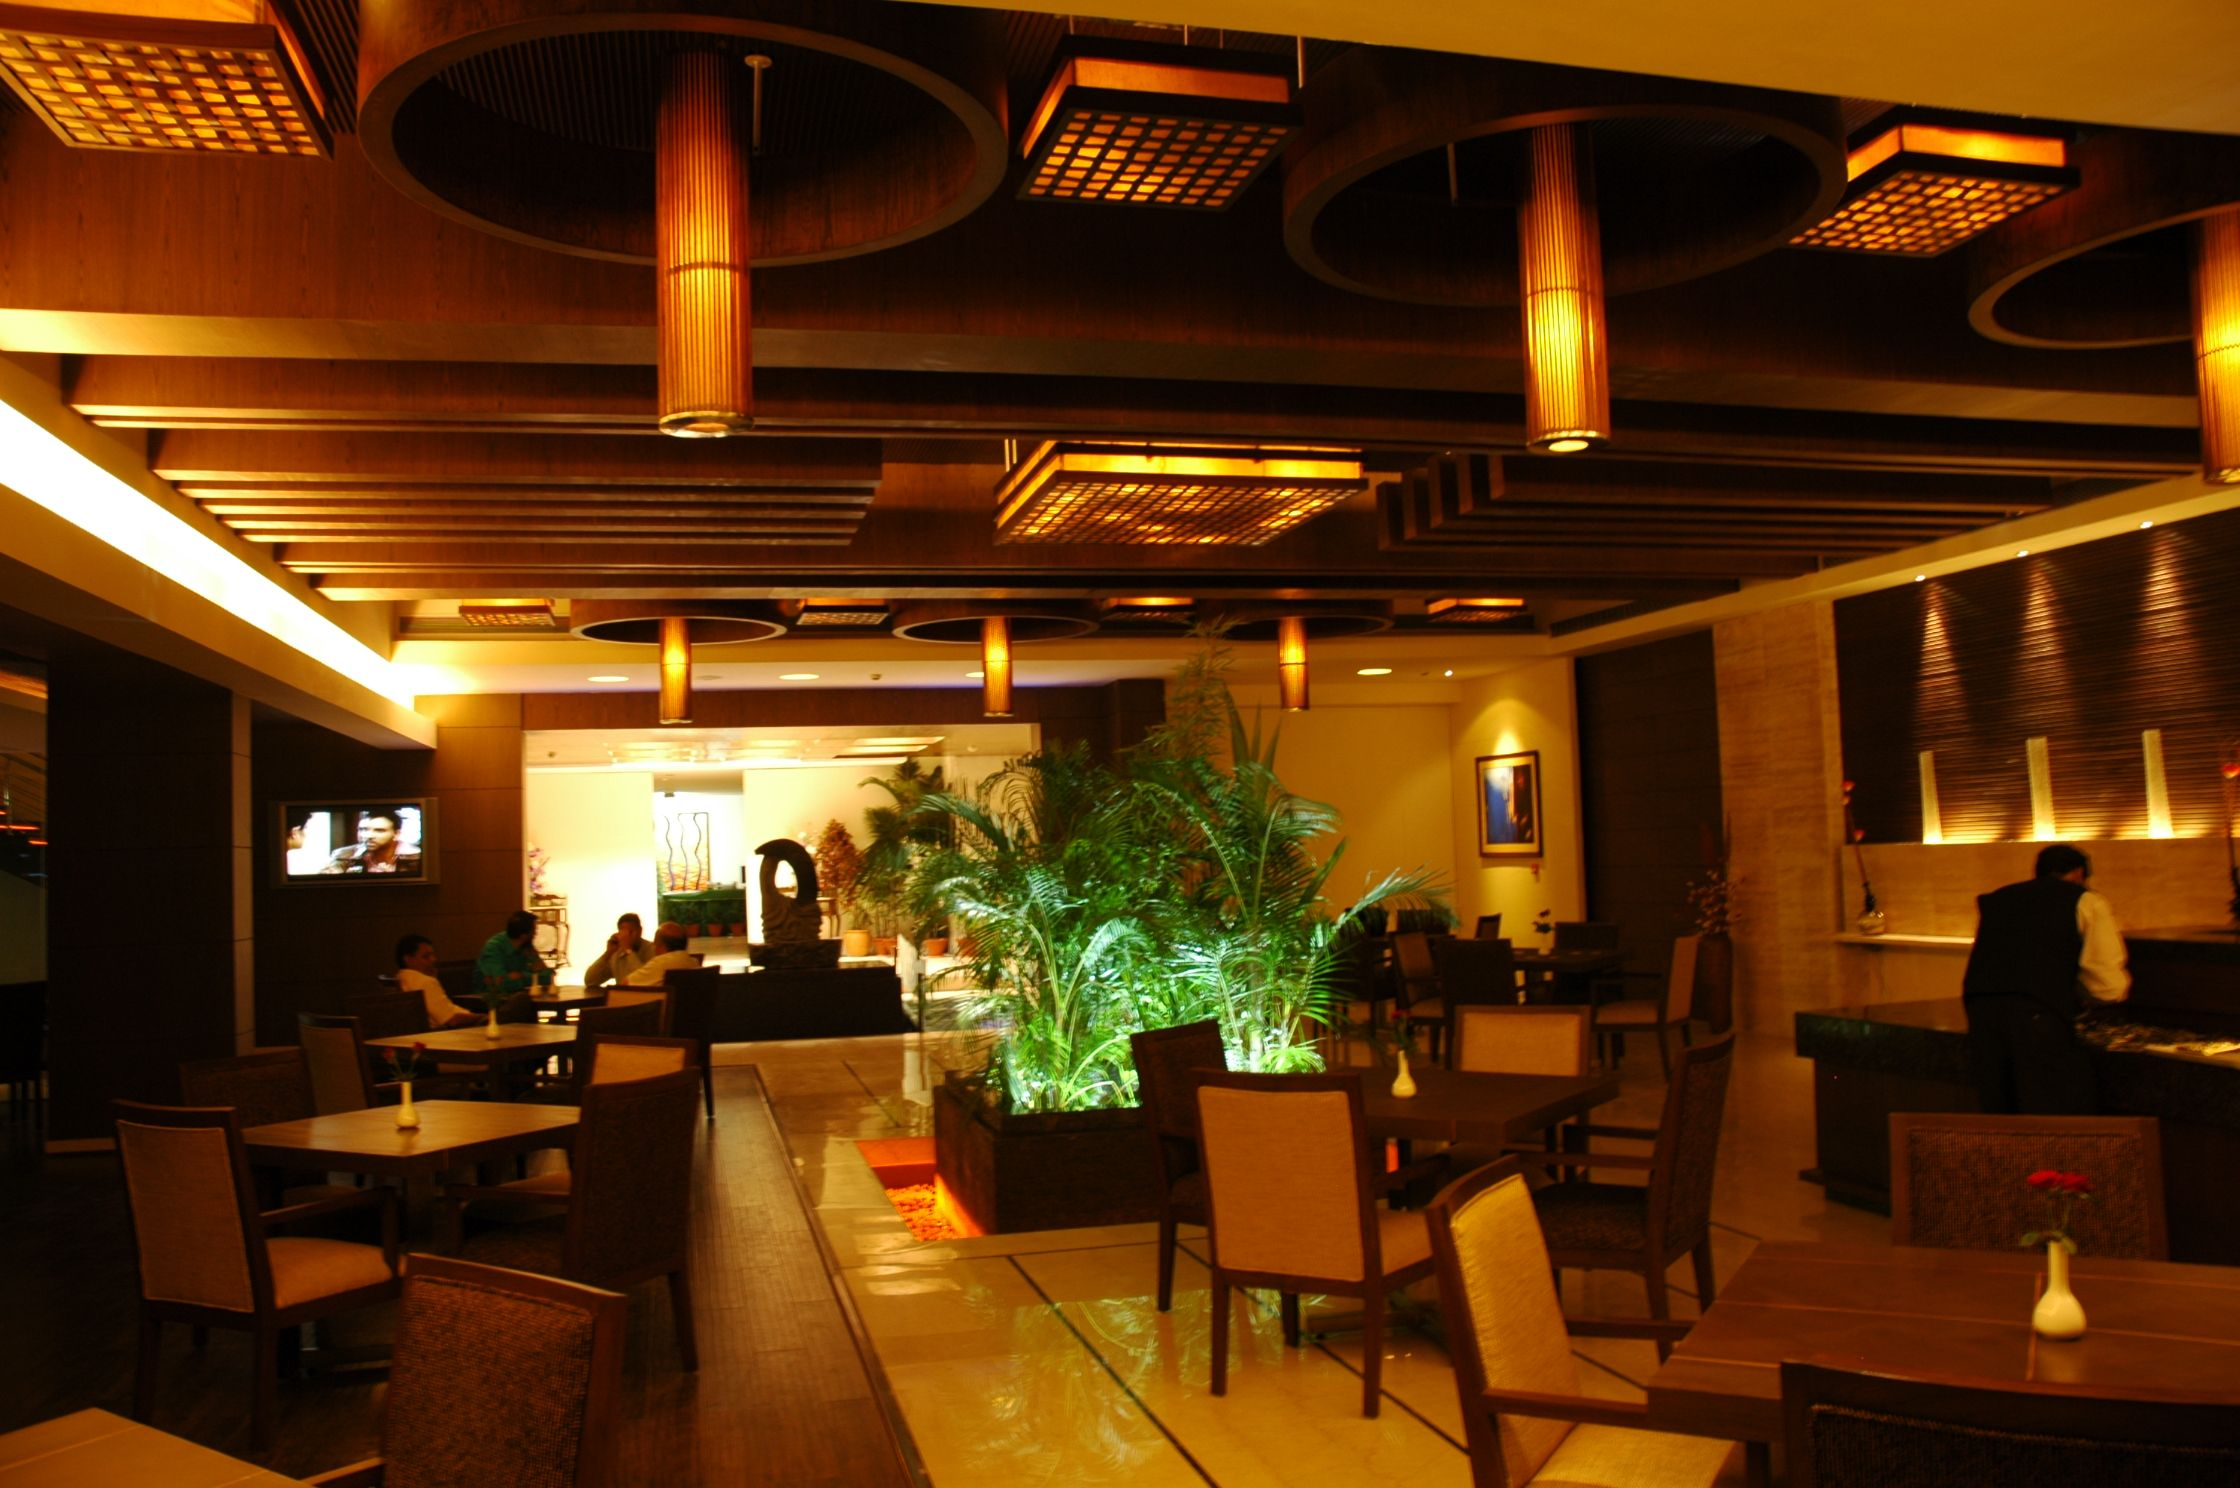 coffee shop furniture | coffee shop | pinterest | coffee shop